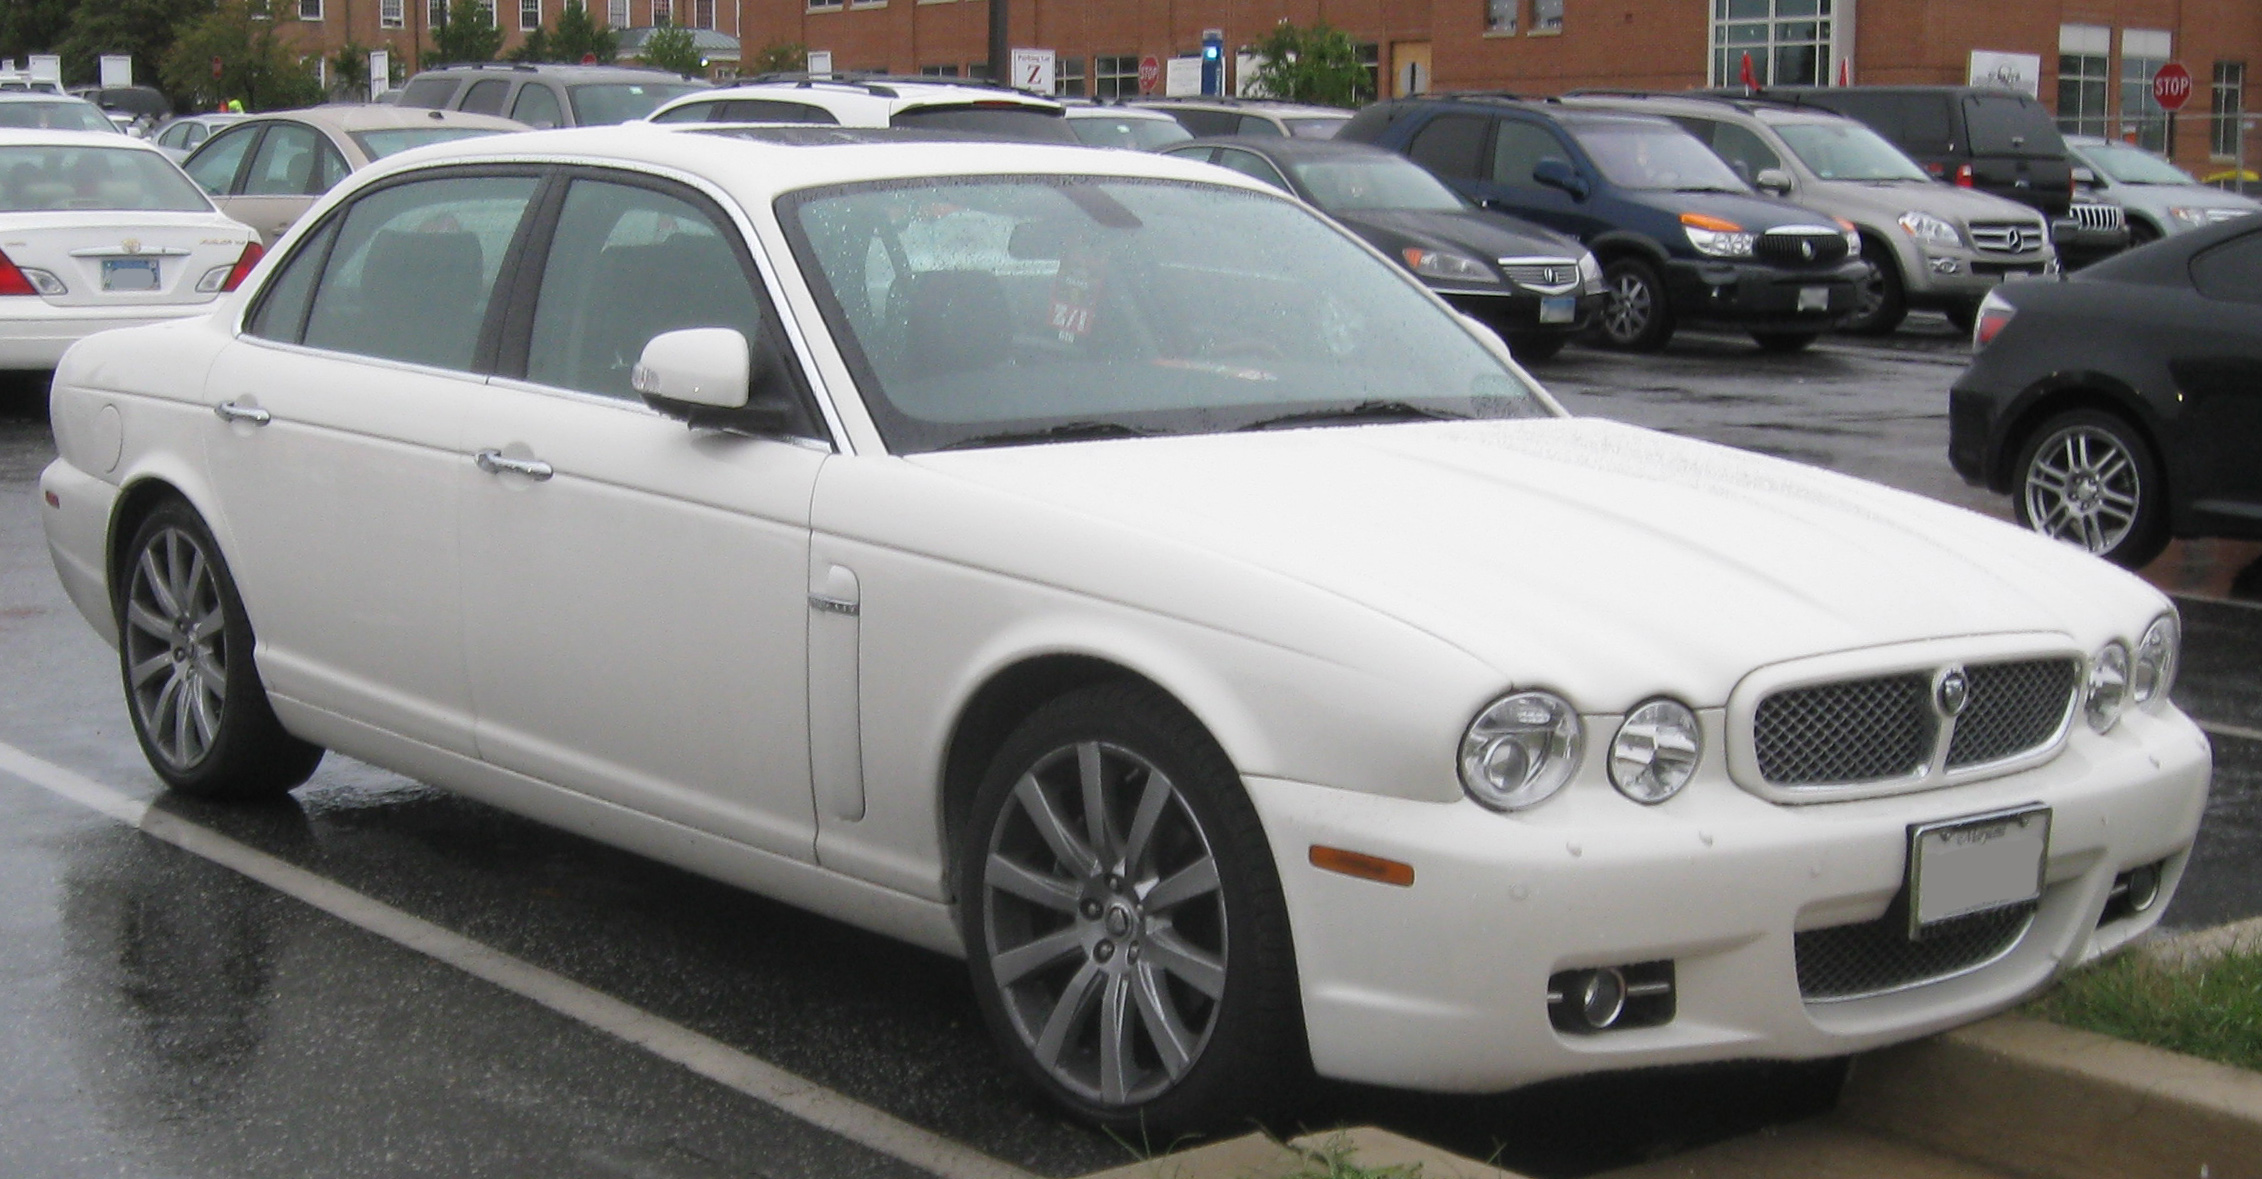 Jaguar XJR III (X358) 2007 - 2010 Sedan #3